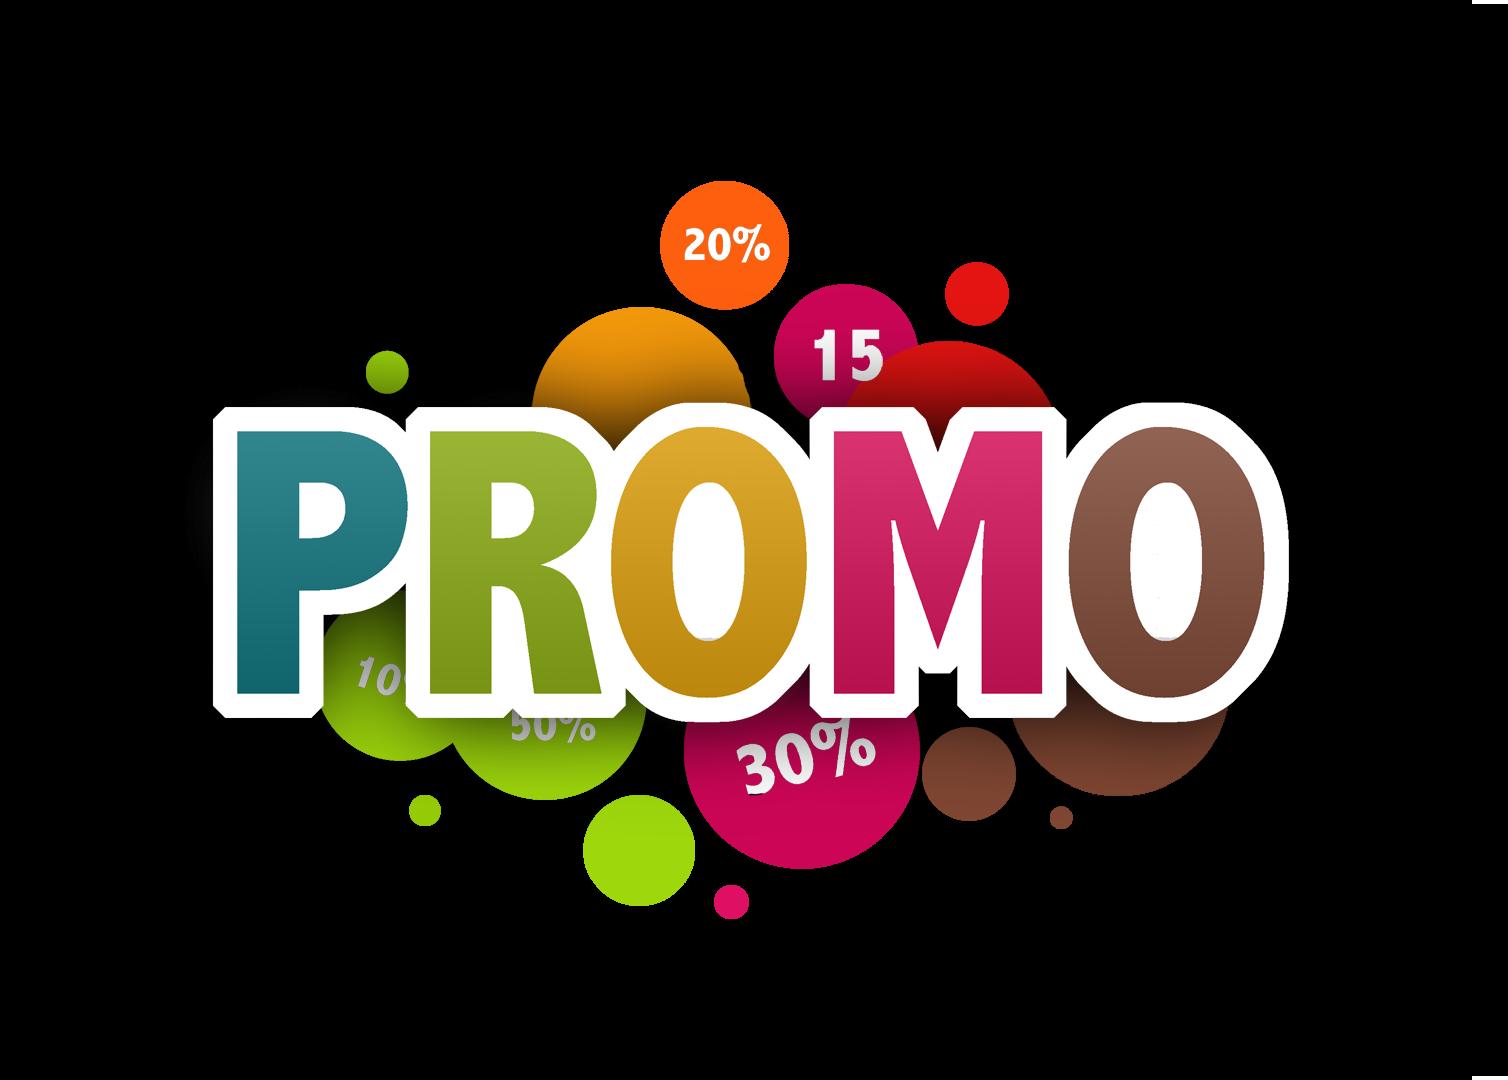 Promo VPS Jibas Server Online November Ceria 2018